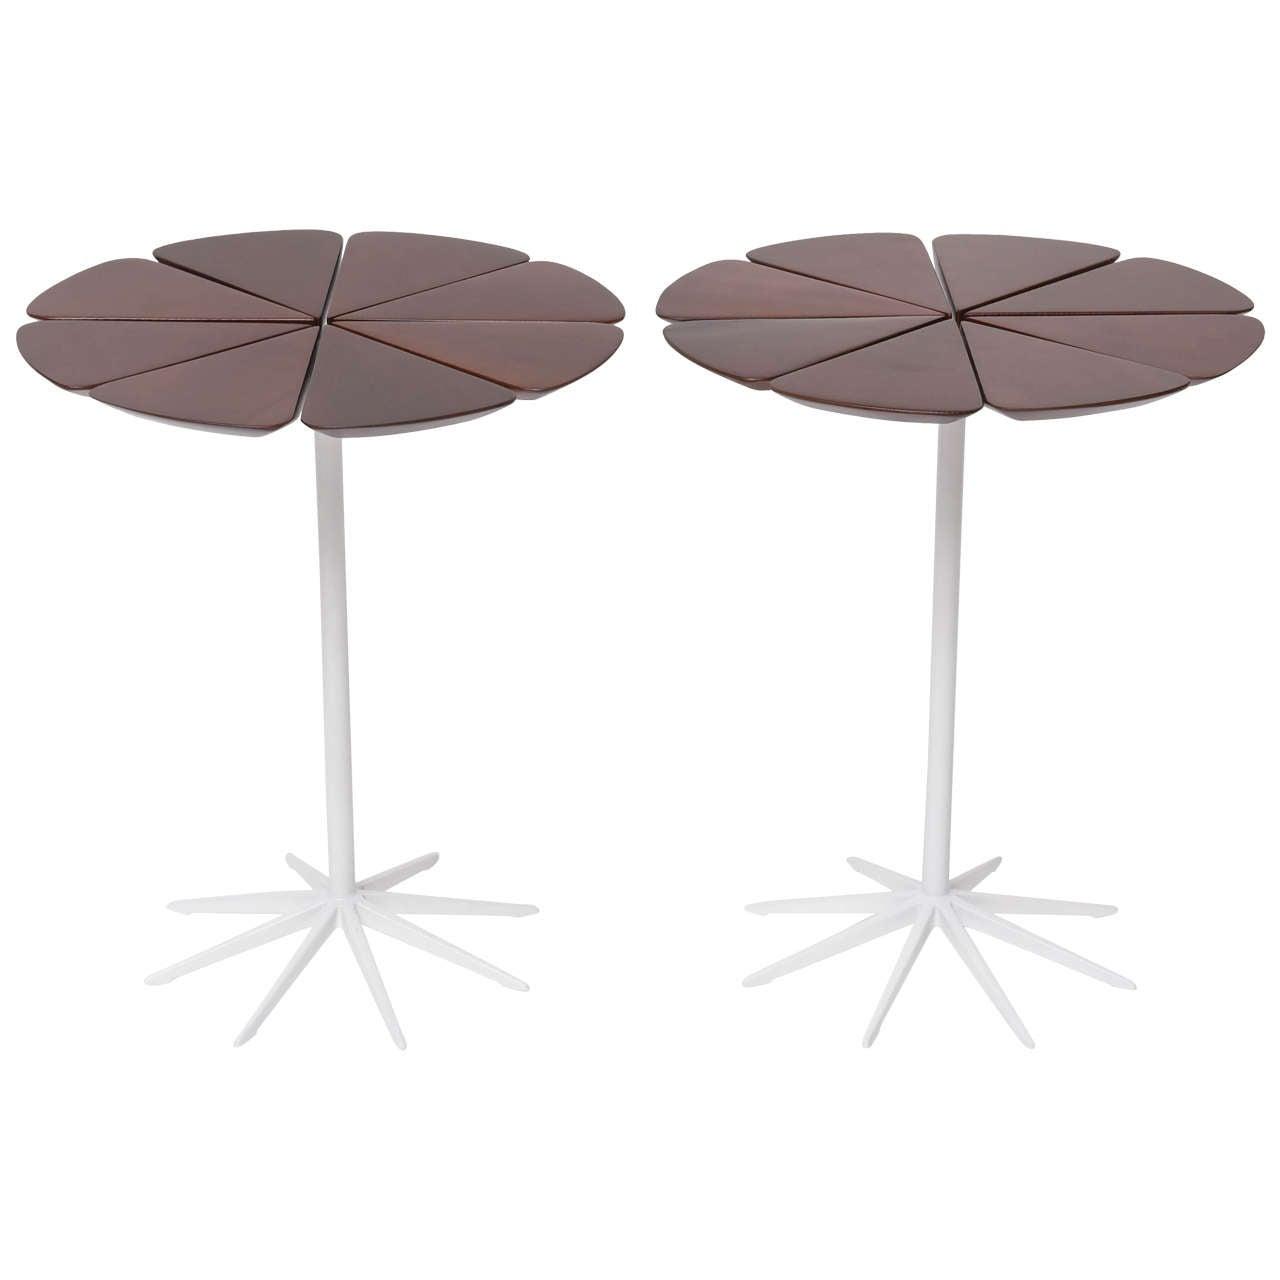 Pair of Richard Schultz Petal Side Tables